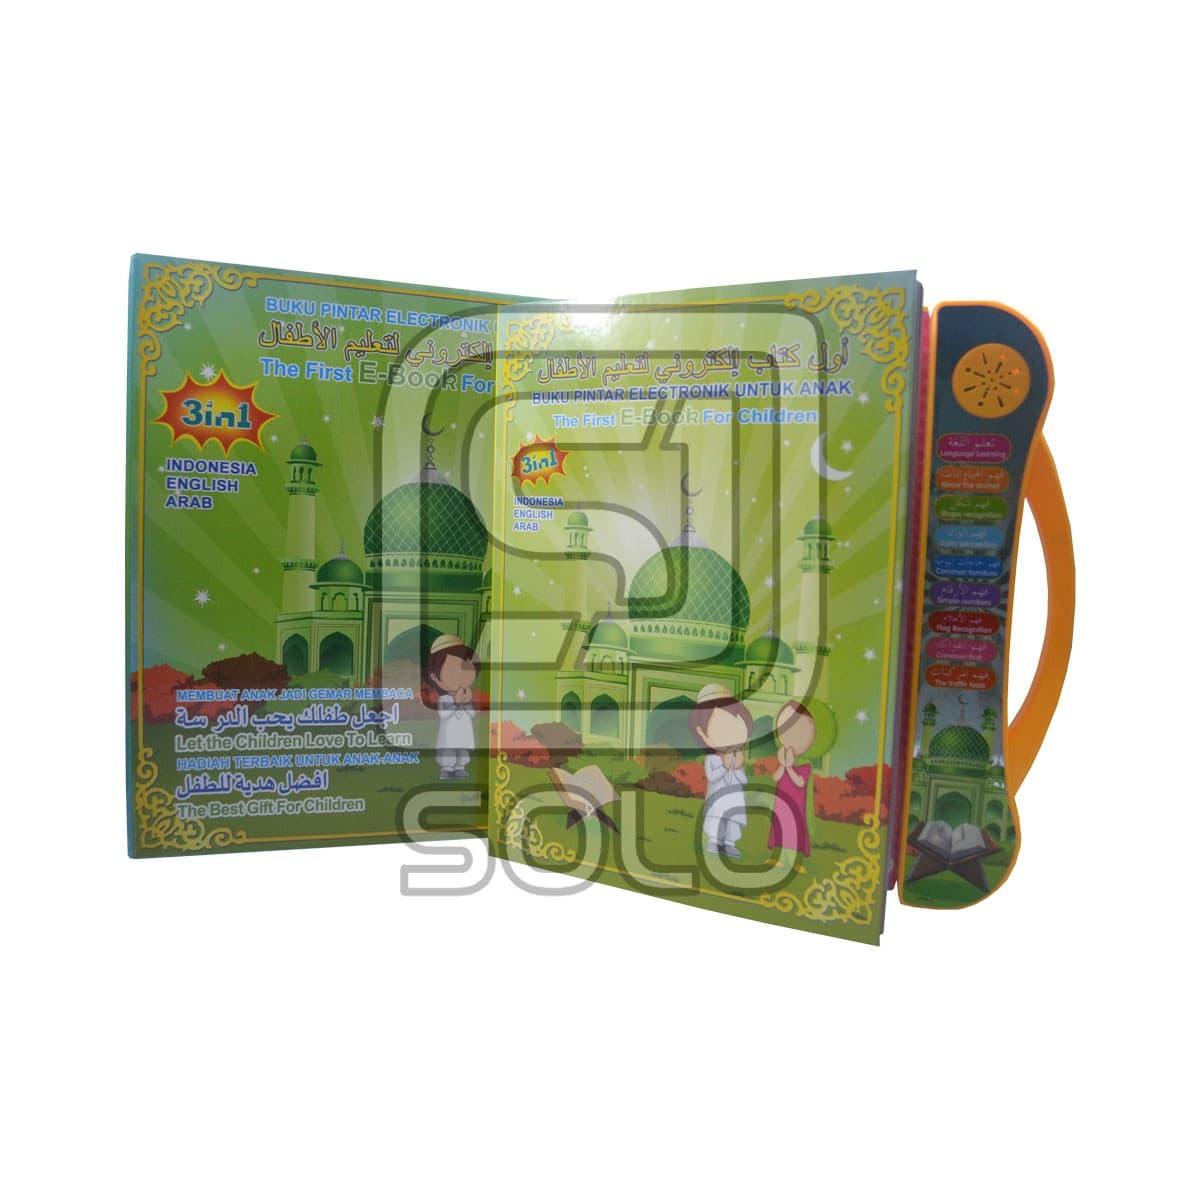 Eigia LED E Book 2 Bahasa Indonesia & Inggris Mainan Edukasi 7L Pink. Cek Harga Baru My English E Book Mainan Anak Balita Edukasi Source · E Book 3 Bahasa ...